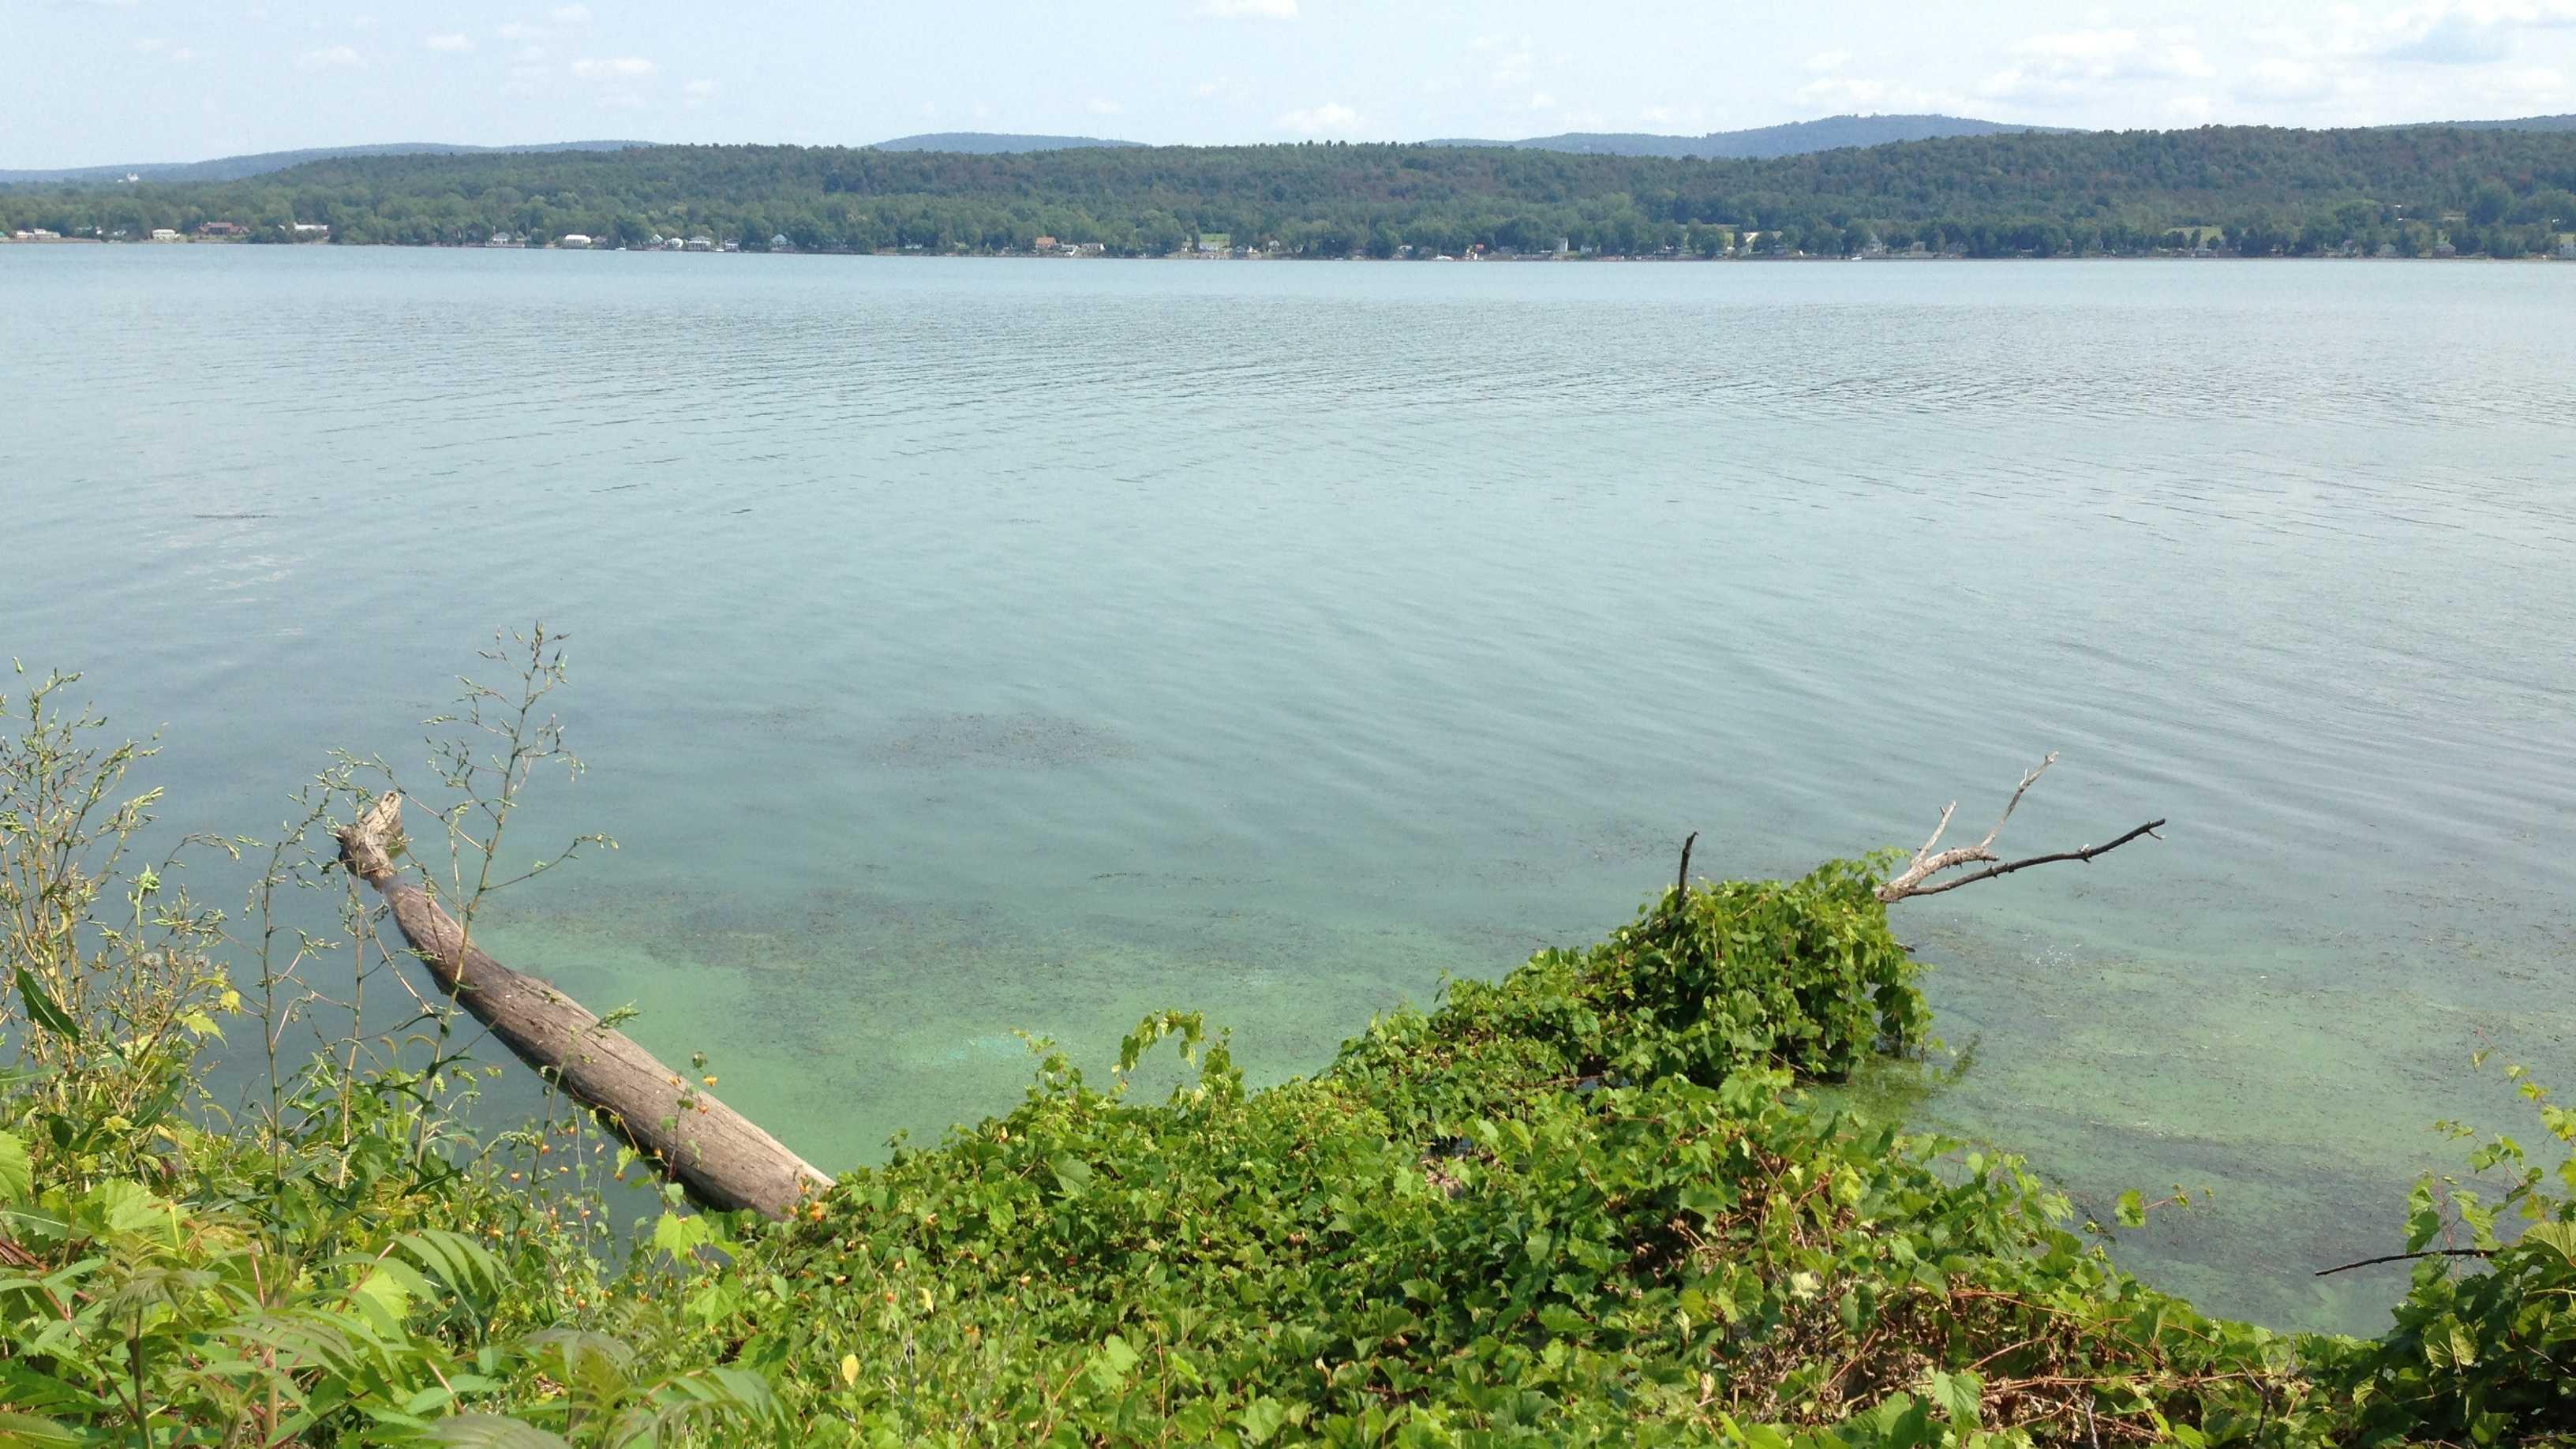 Algae blooms fouled St. Albans Bay on Lake Champlain last summer.